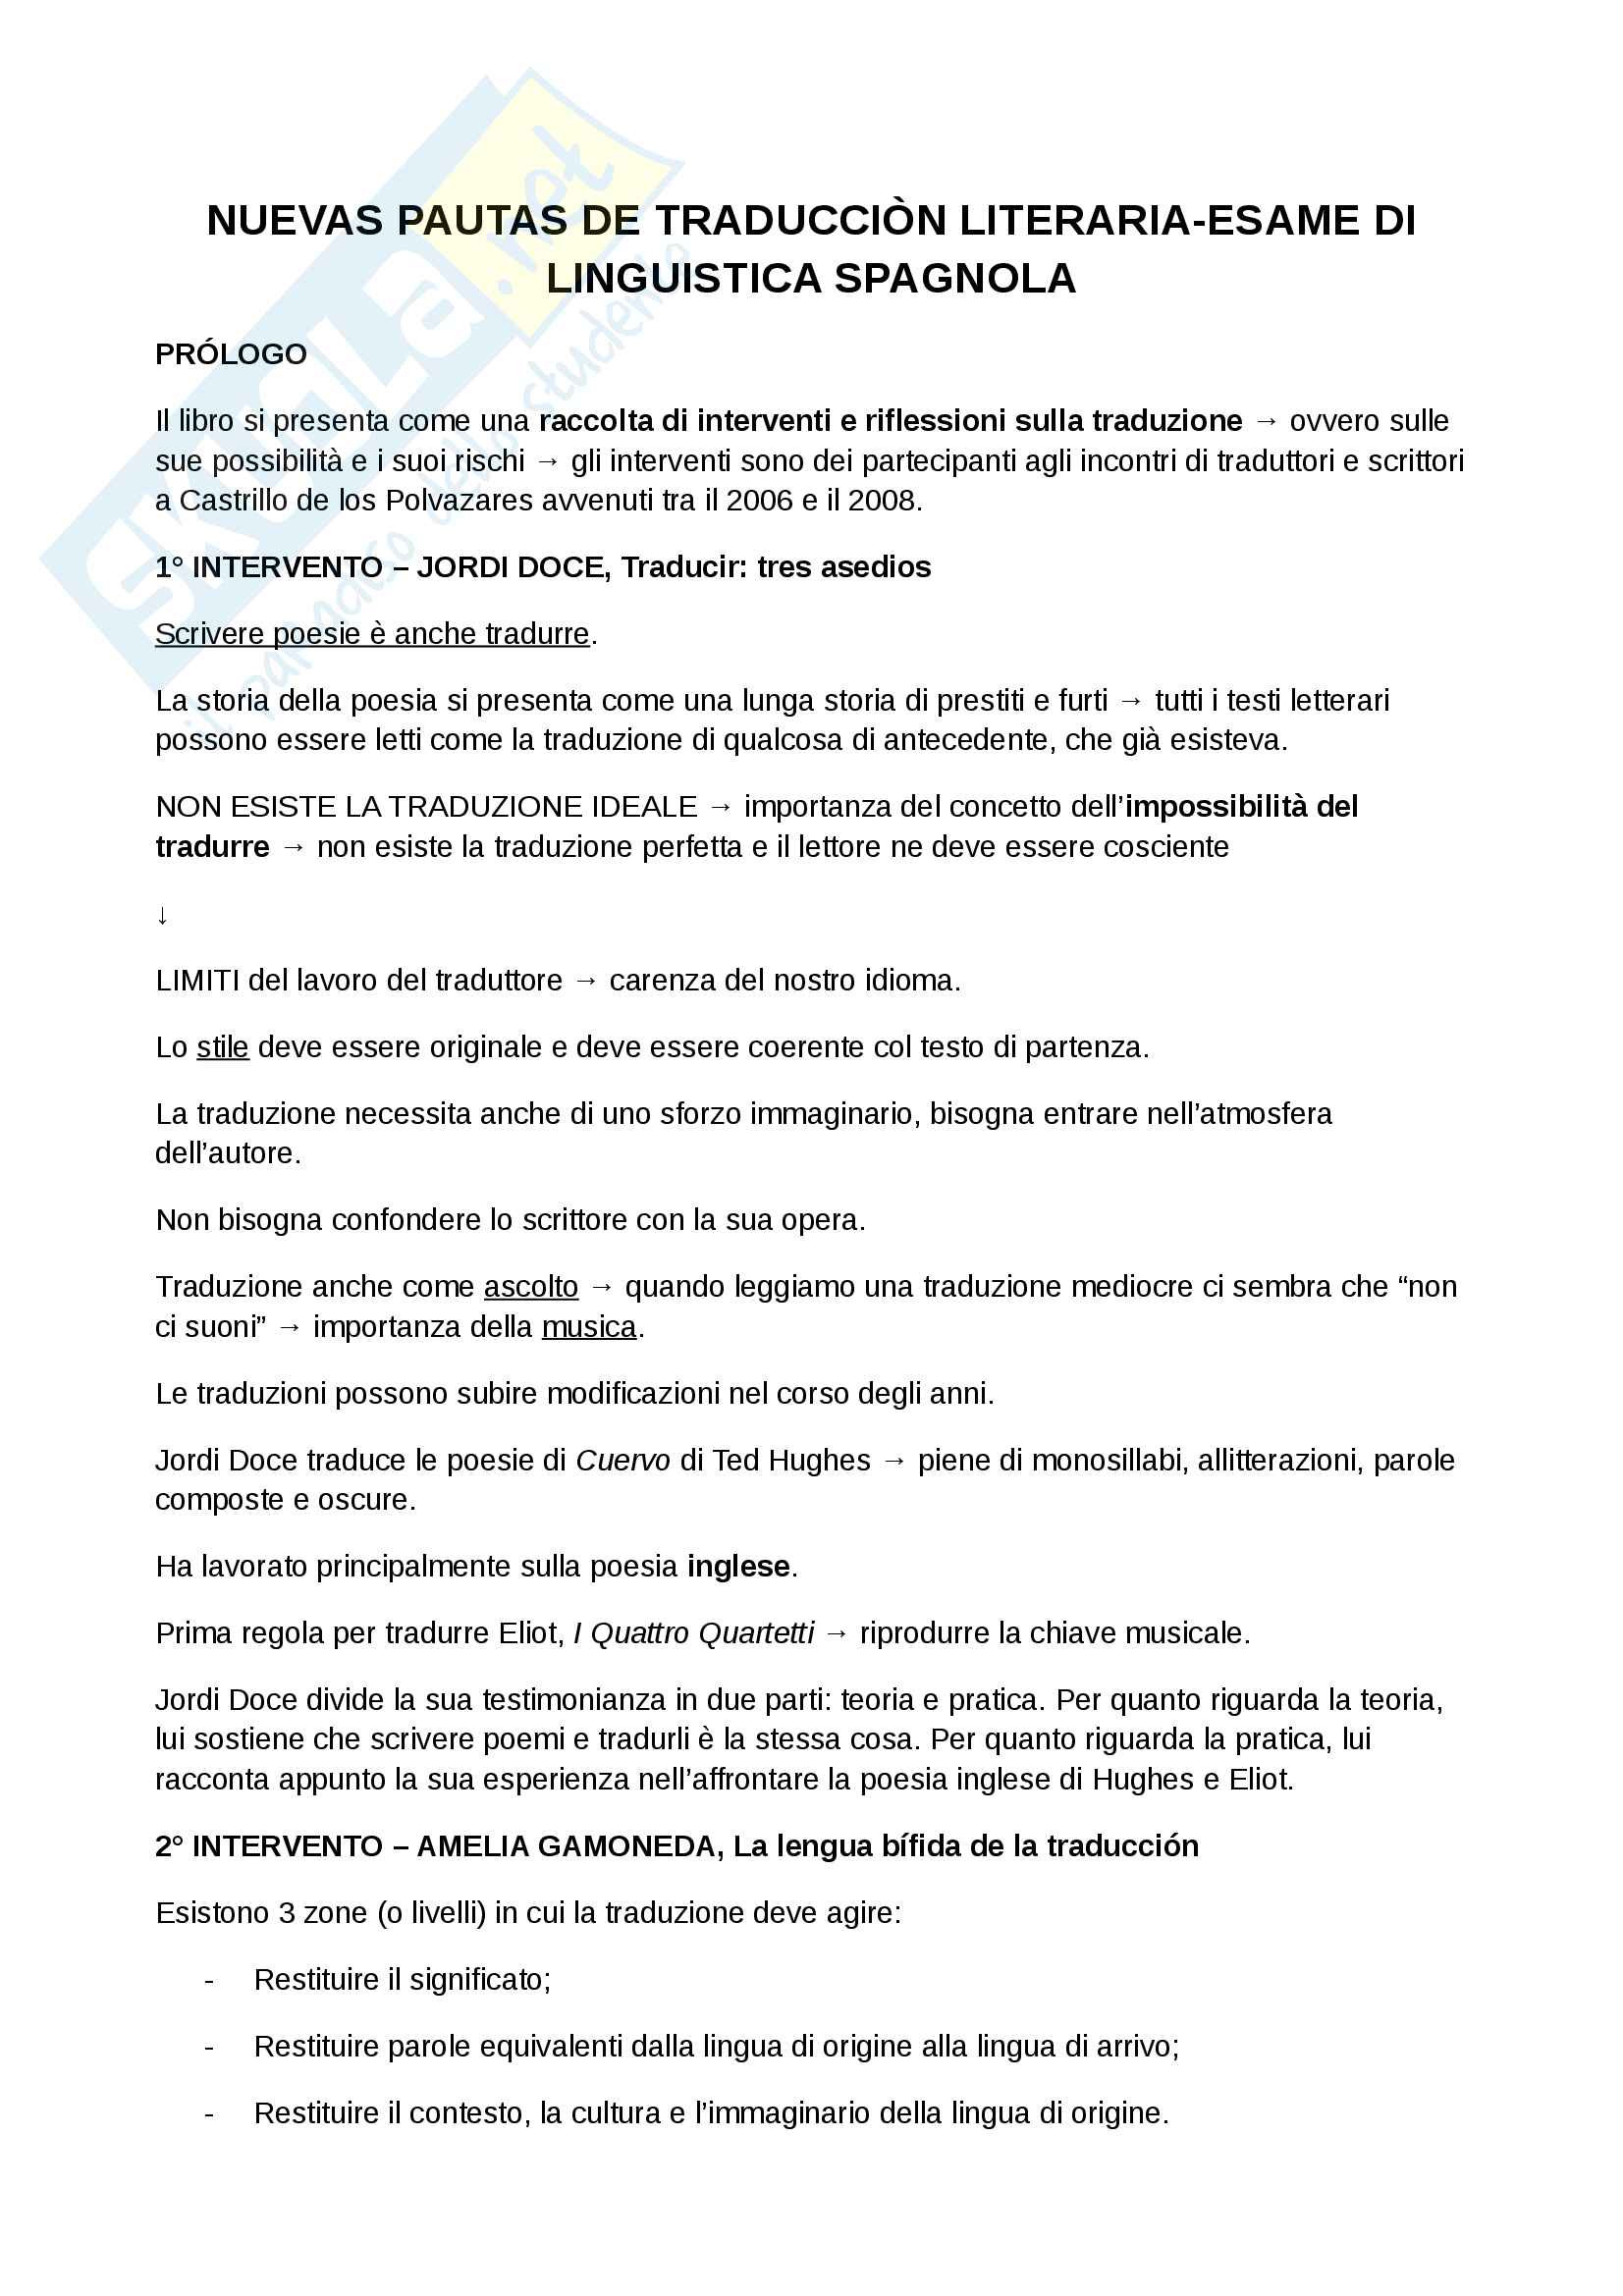 Riassunto esame Linguistica spagnola 1, Esame Martinez, libro consigliato: Nuevas pautas de traduccion literaria di J. G. Montero